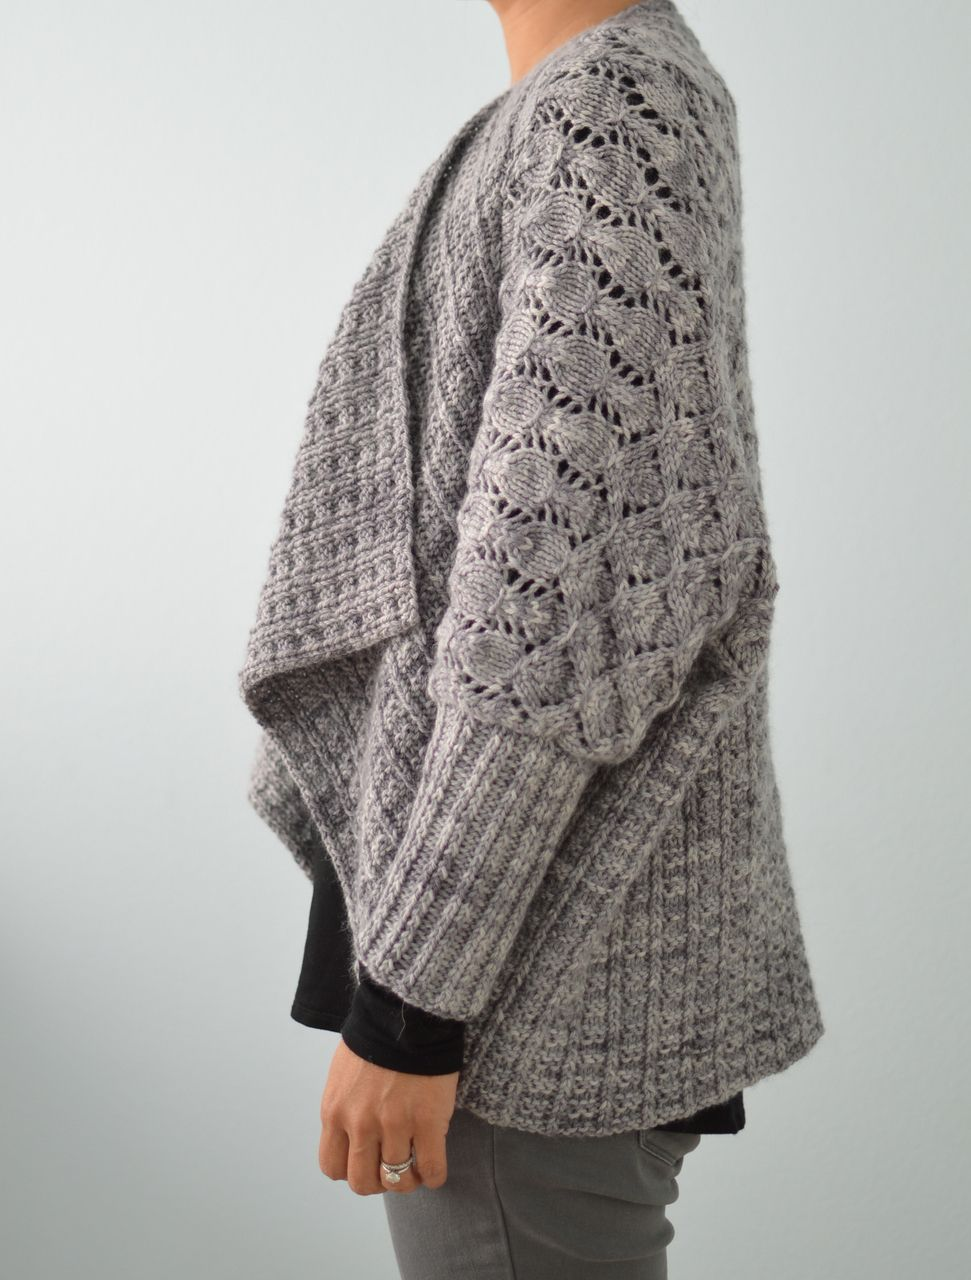 205 Two-Way Wrap Cardigan PDF Knitting Pattern | Pinterest | Wrap ...